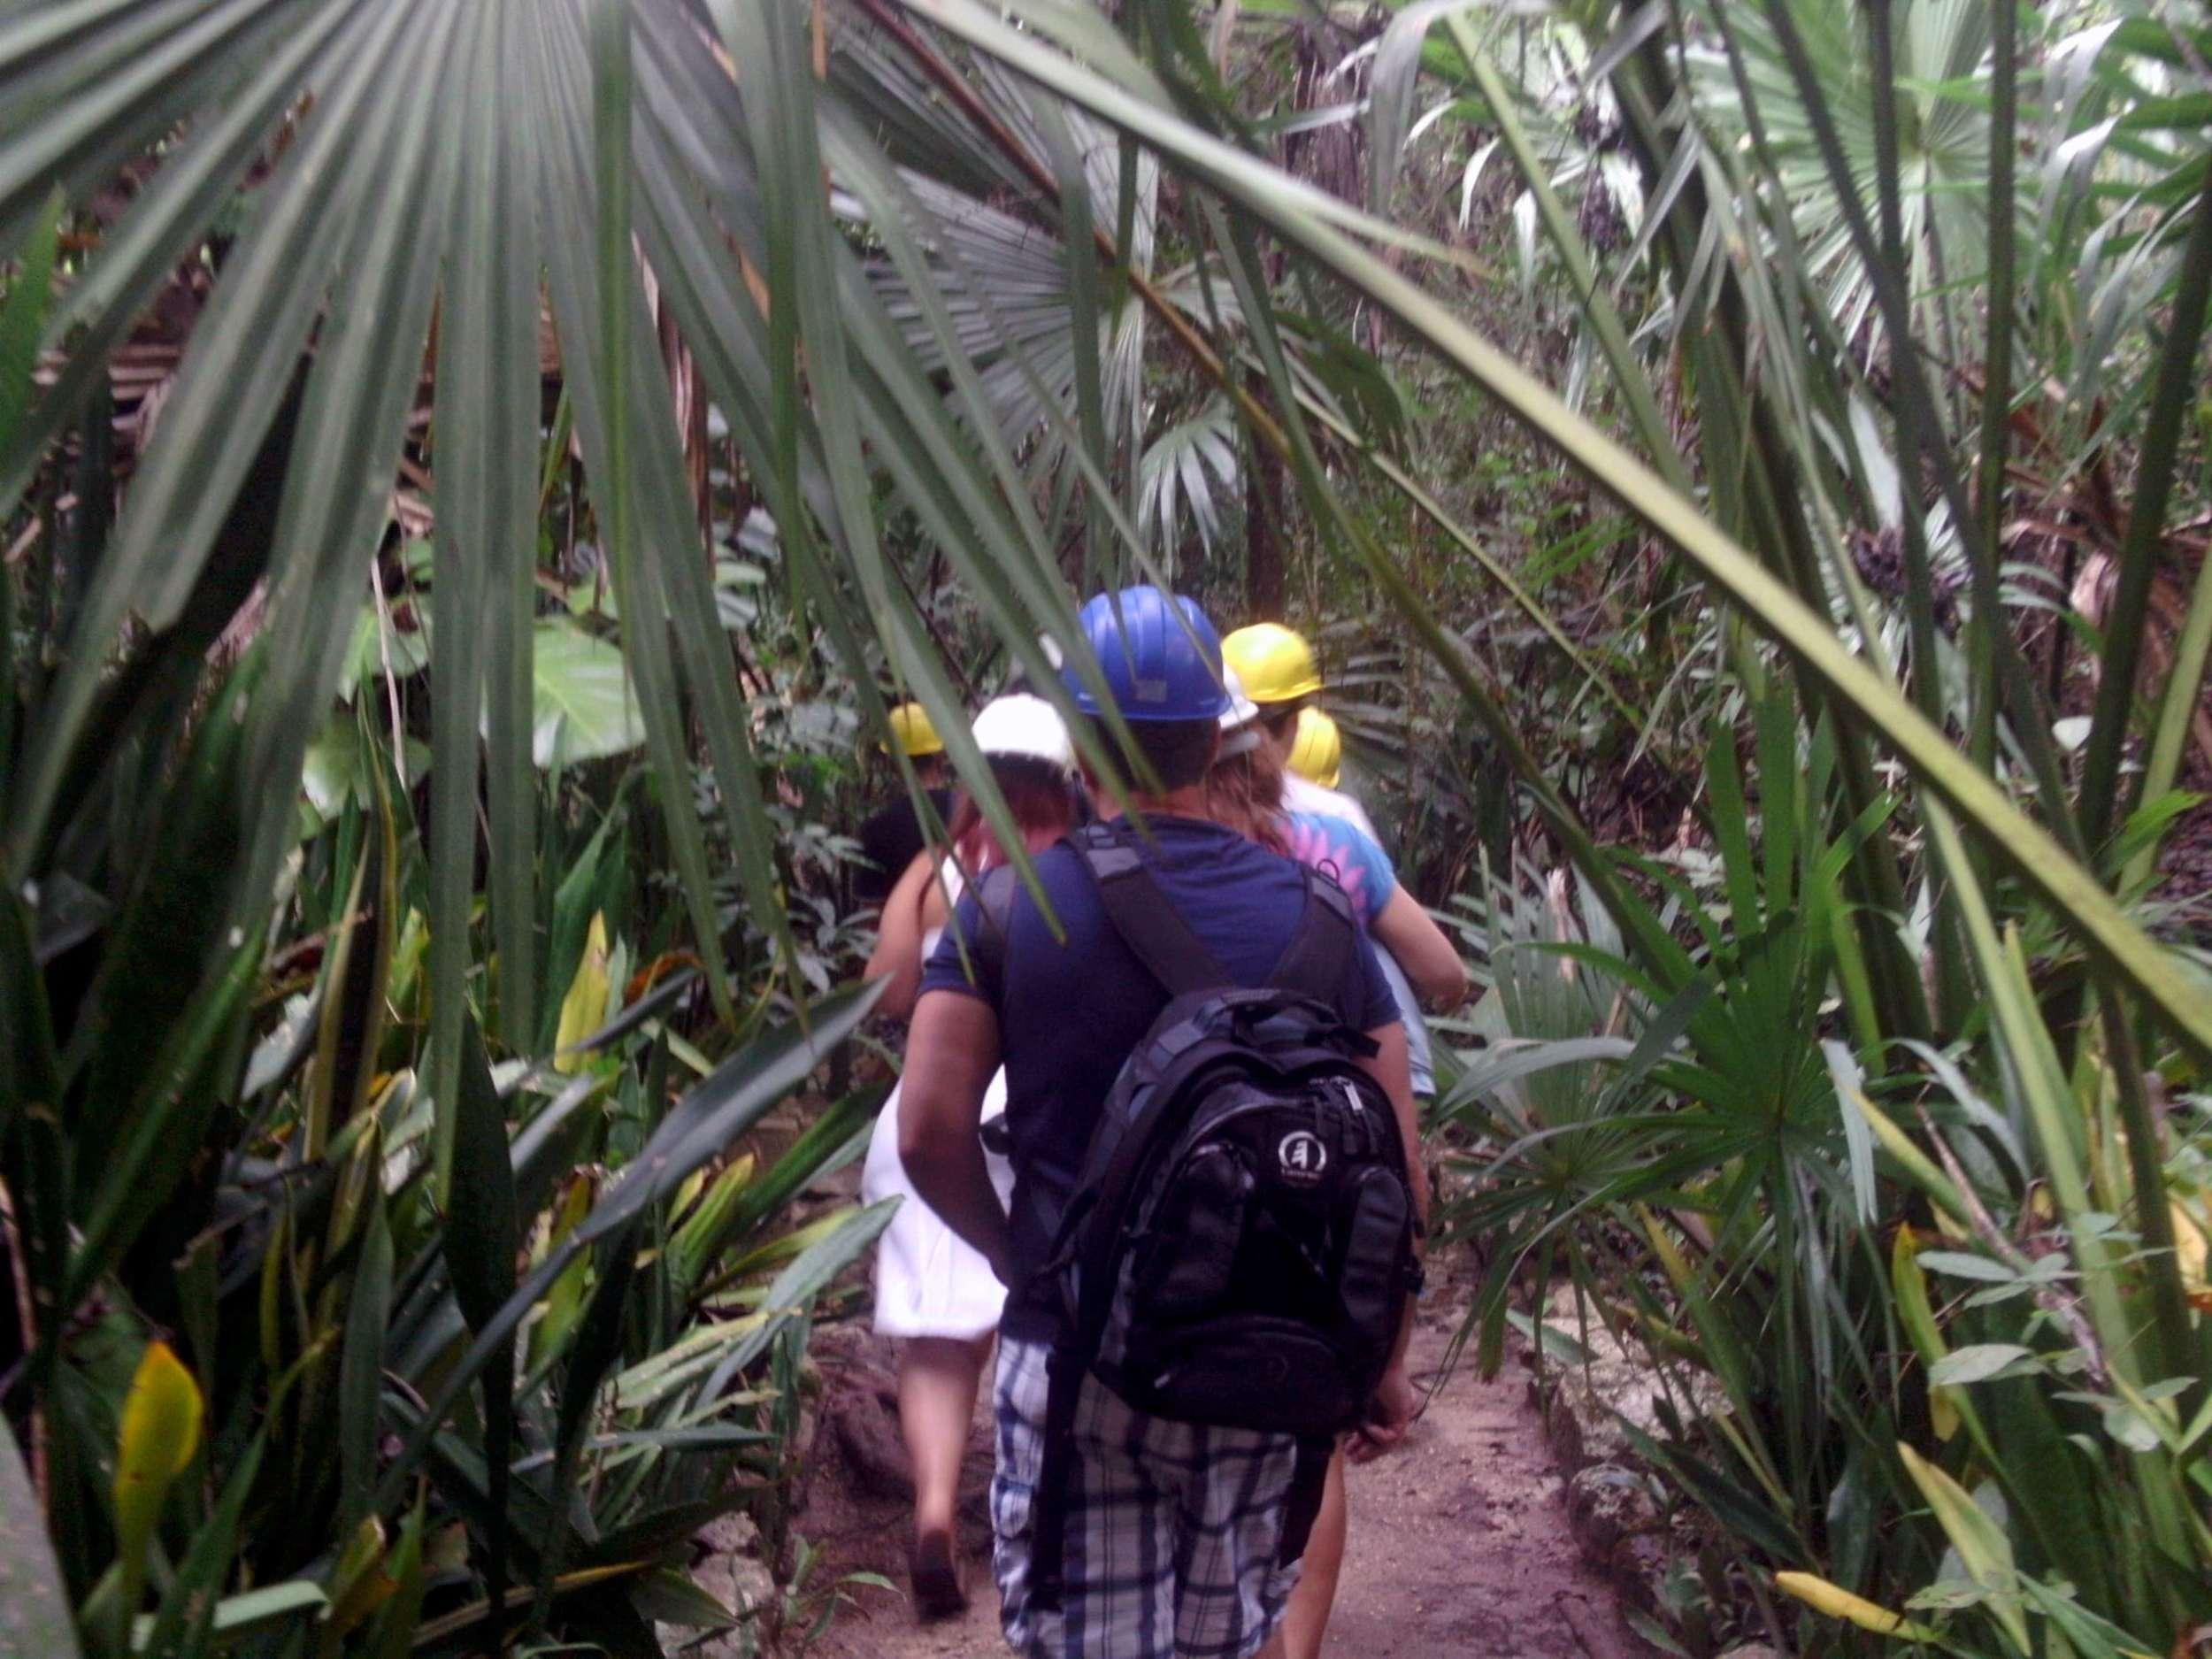 mainland off Cozumel, hiking through jungle to Chaak Tun cenote near Playa del Carmen